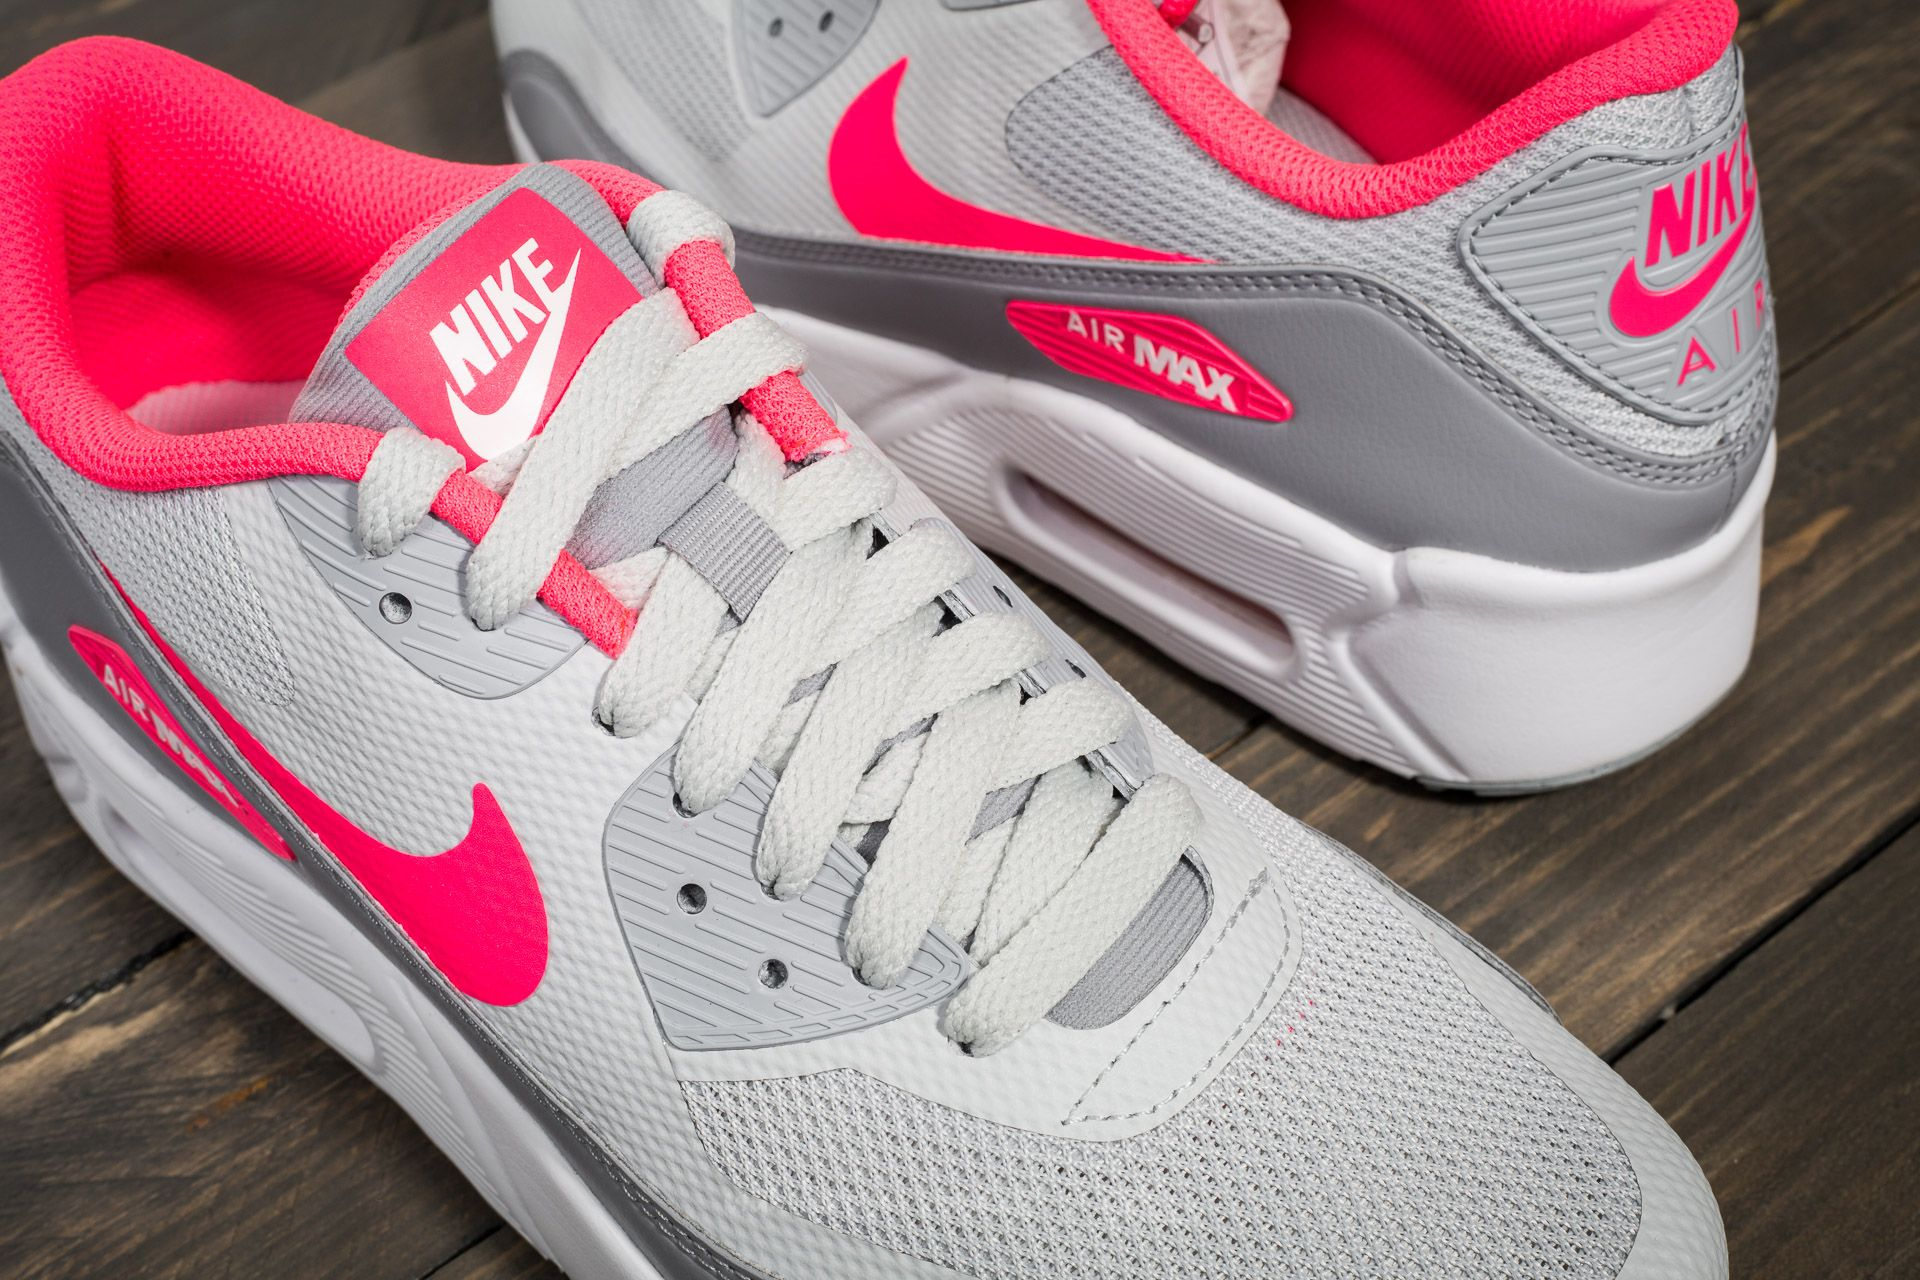 Wmns Nike Air Max 90 Ultra 2.0 Wolf Greypink